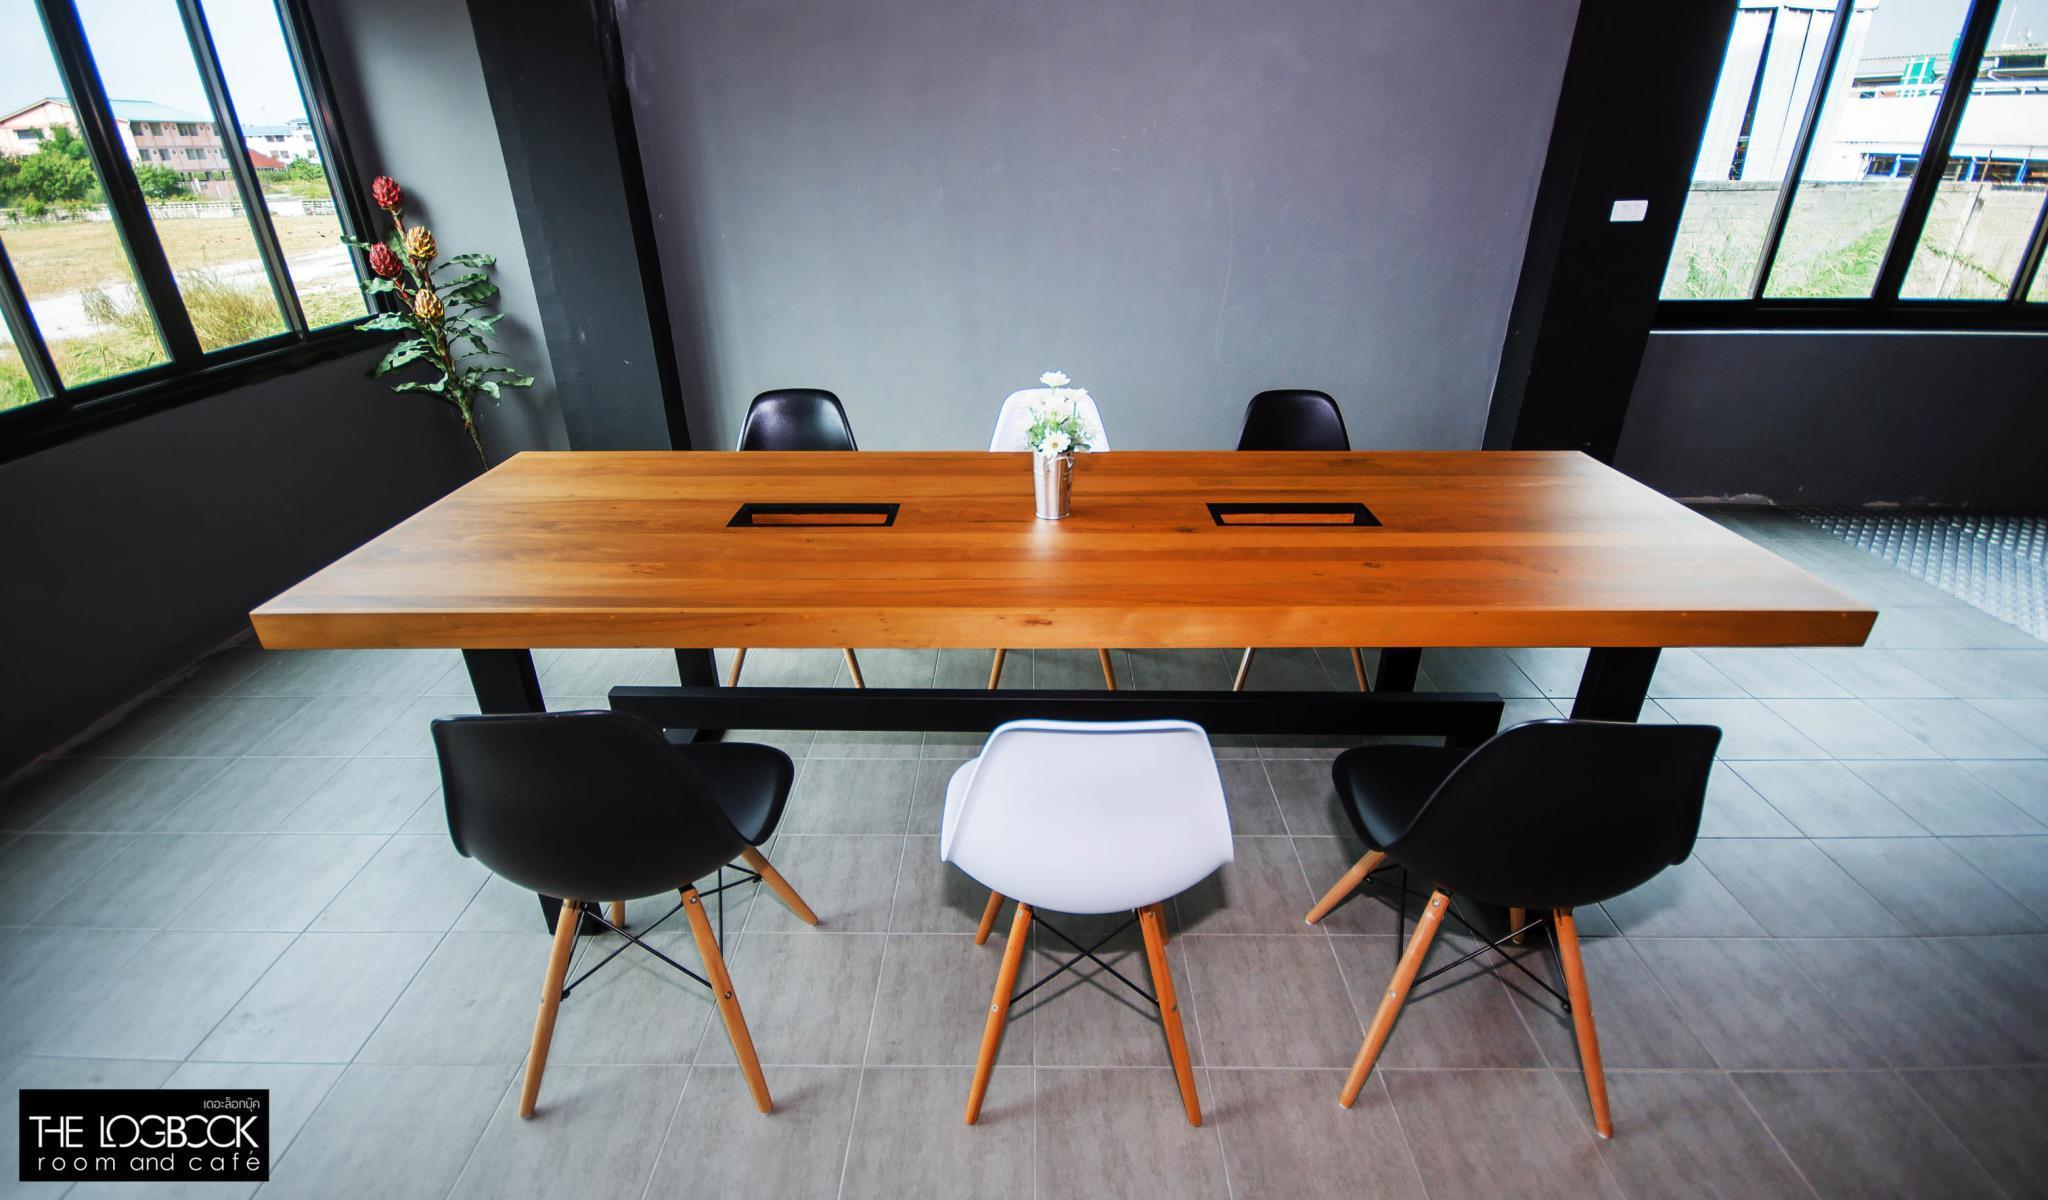 The LogBook room and cafe',เดอะ ล็อกบุ๊ค รูม แอนด์ คาเฟ่